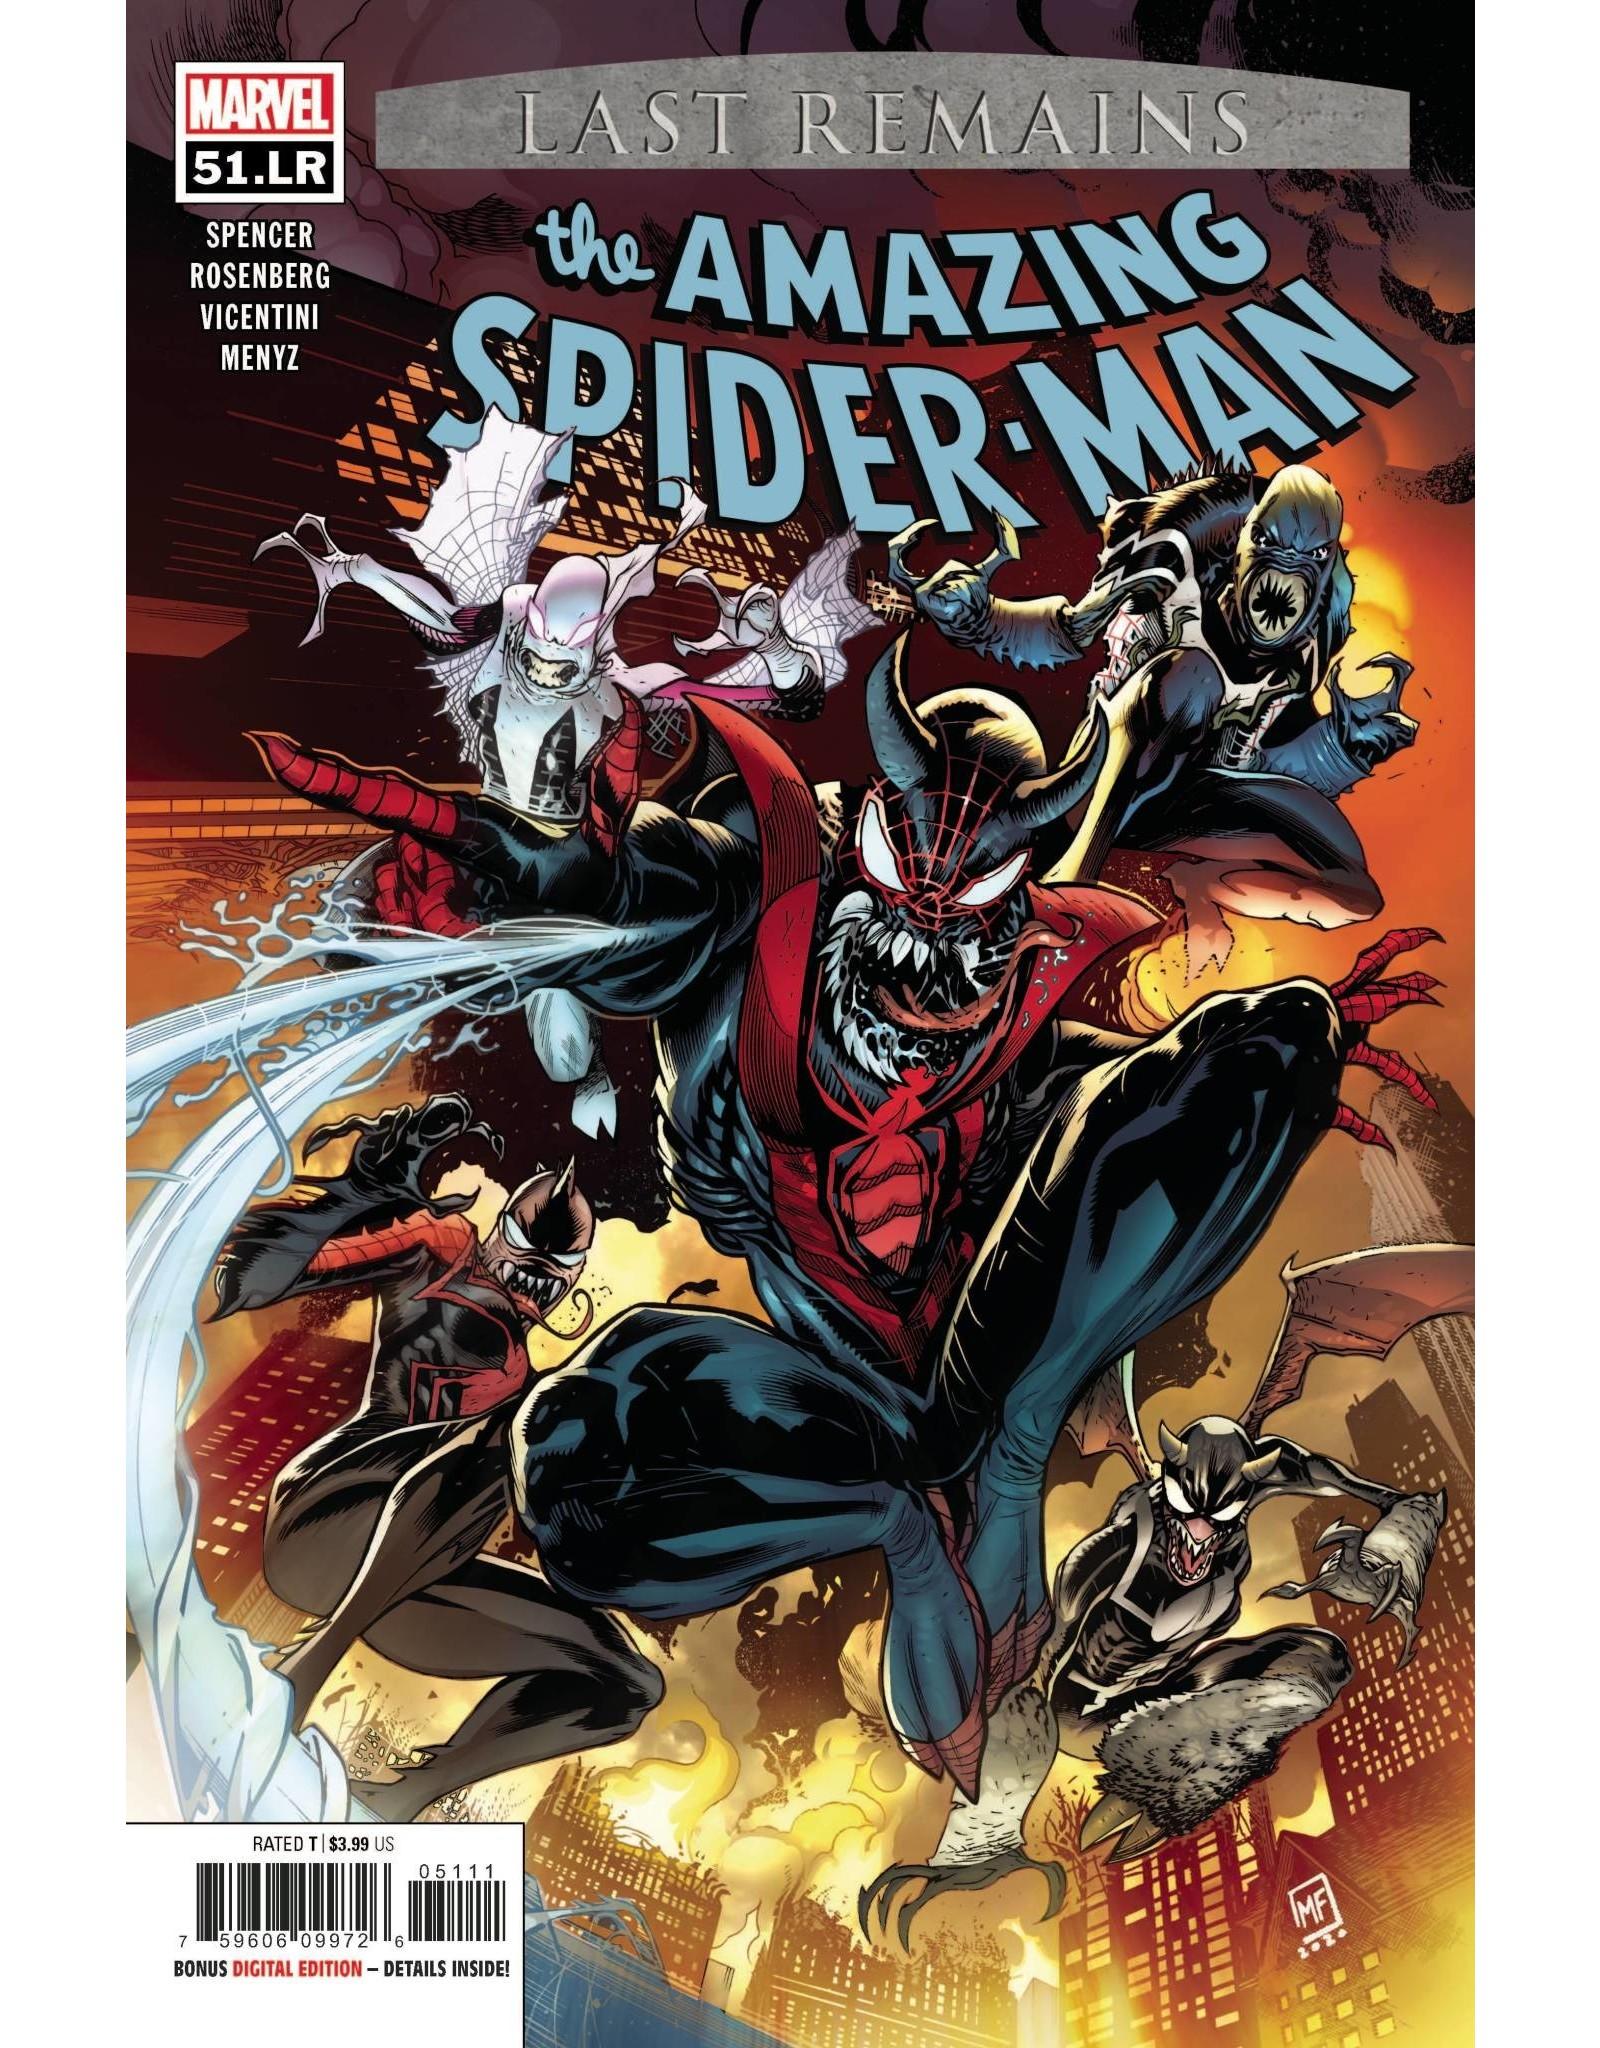 Marvel Comics AMAZING SPIDER-MAN #51.LR